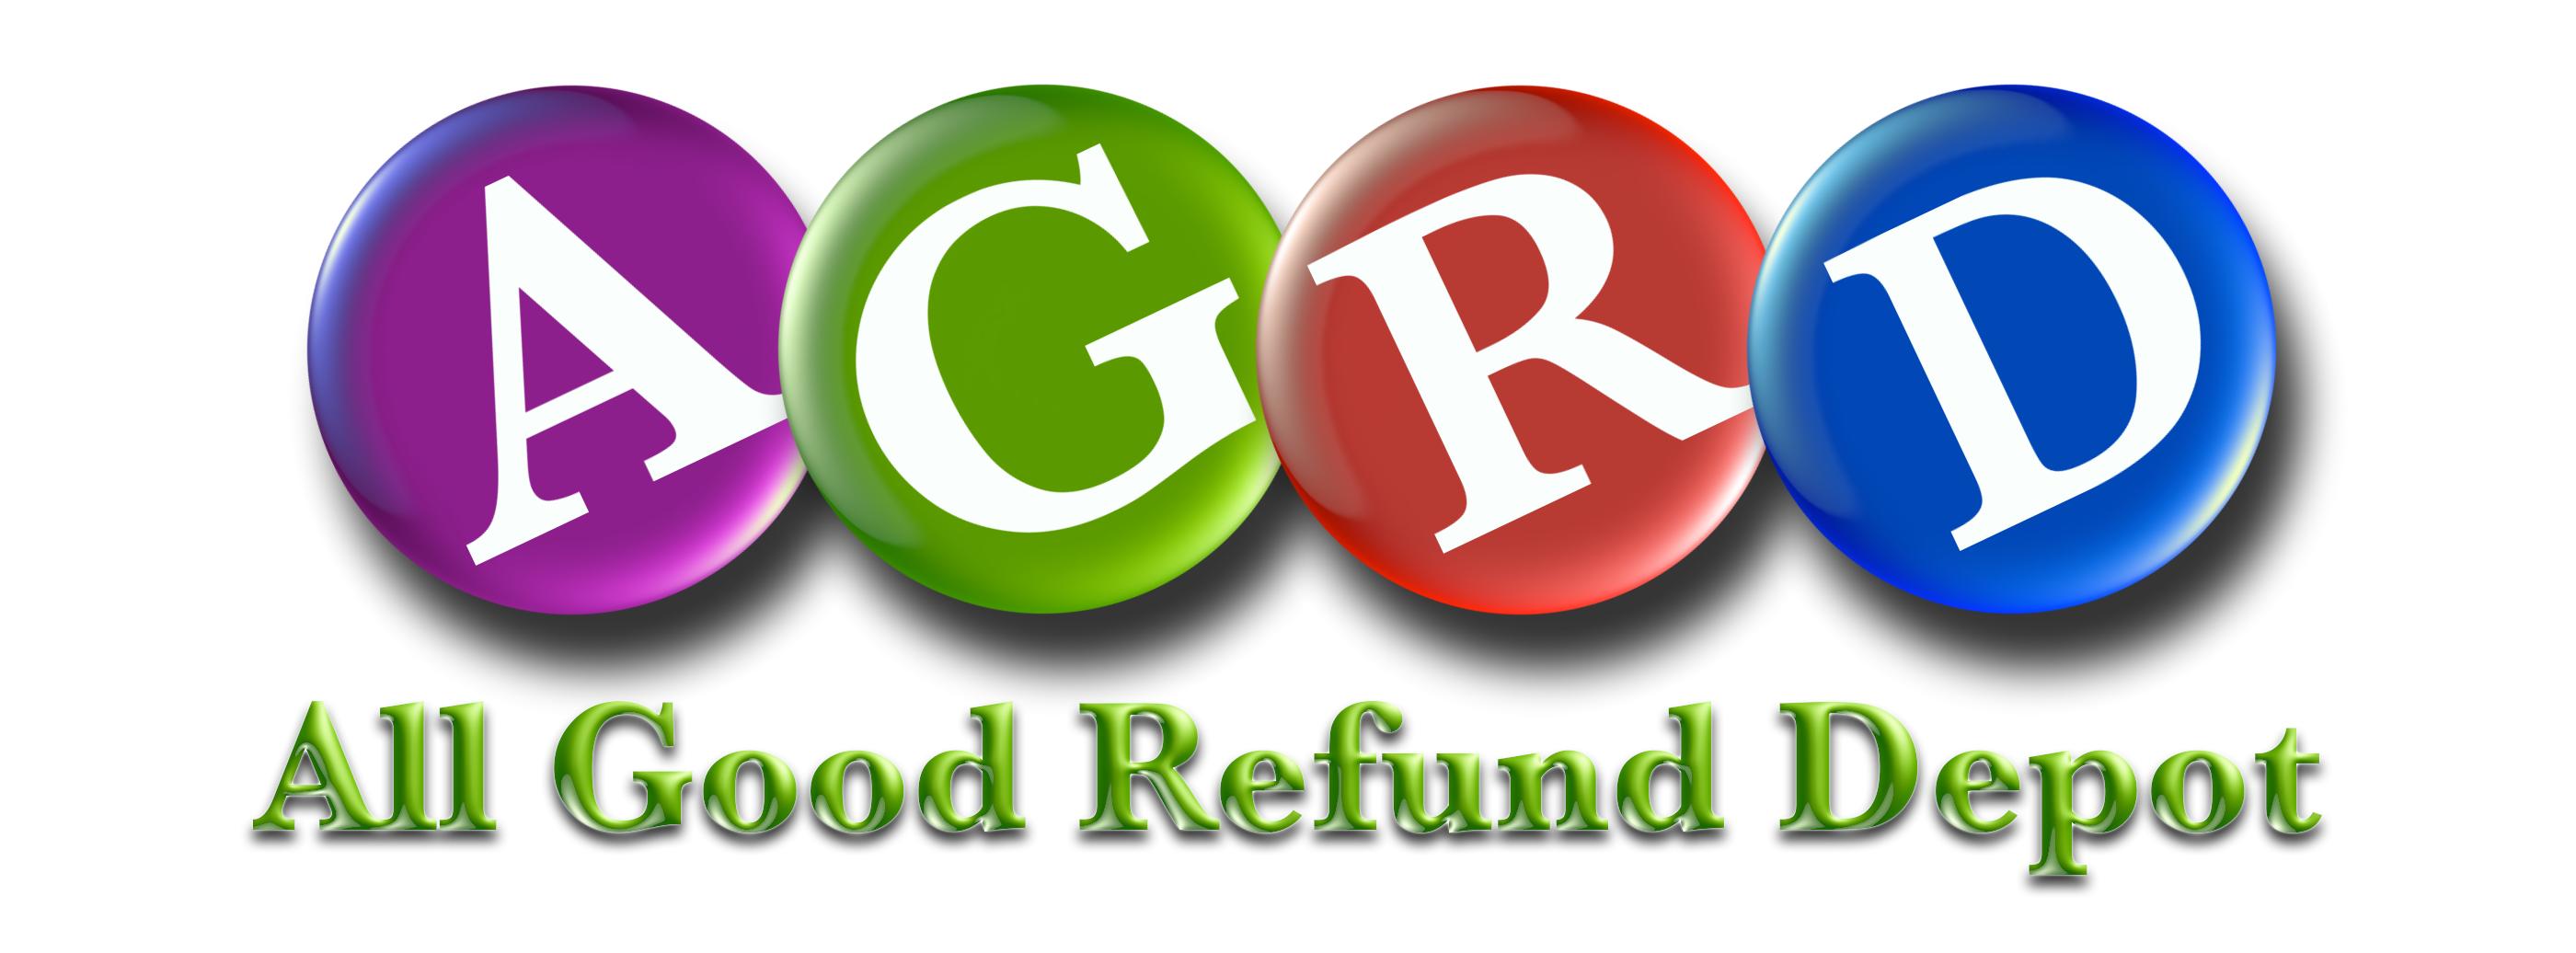 All Good Refund Depot